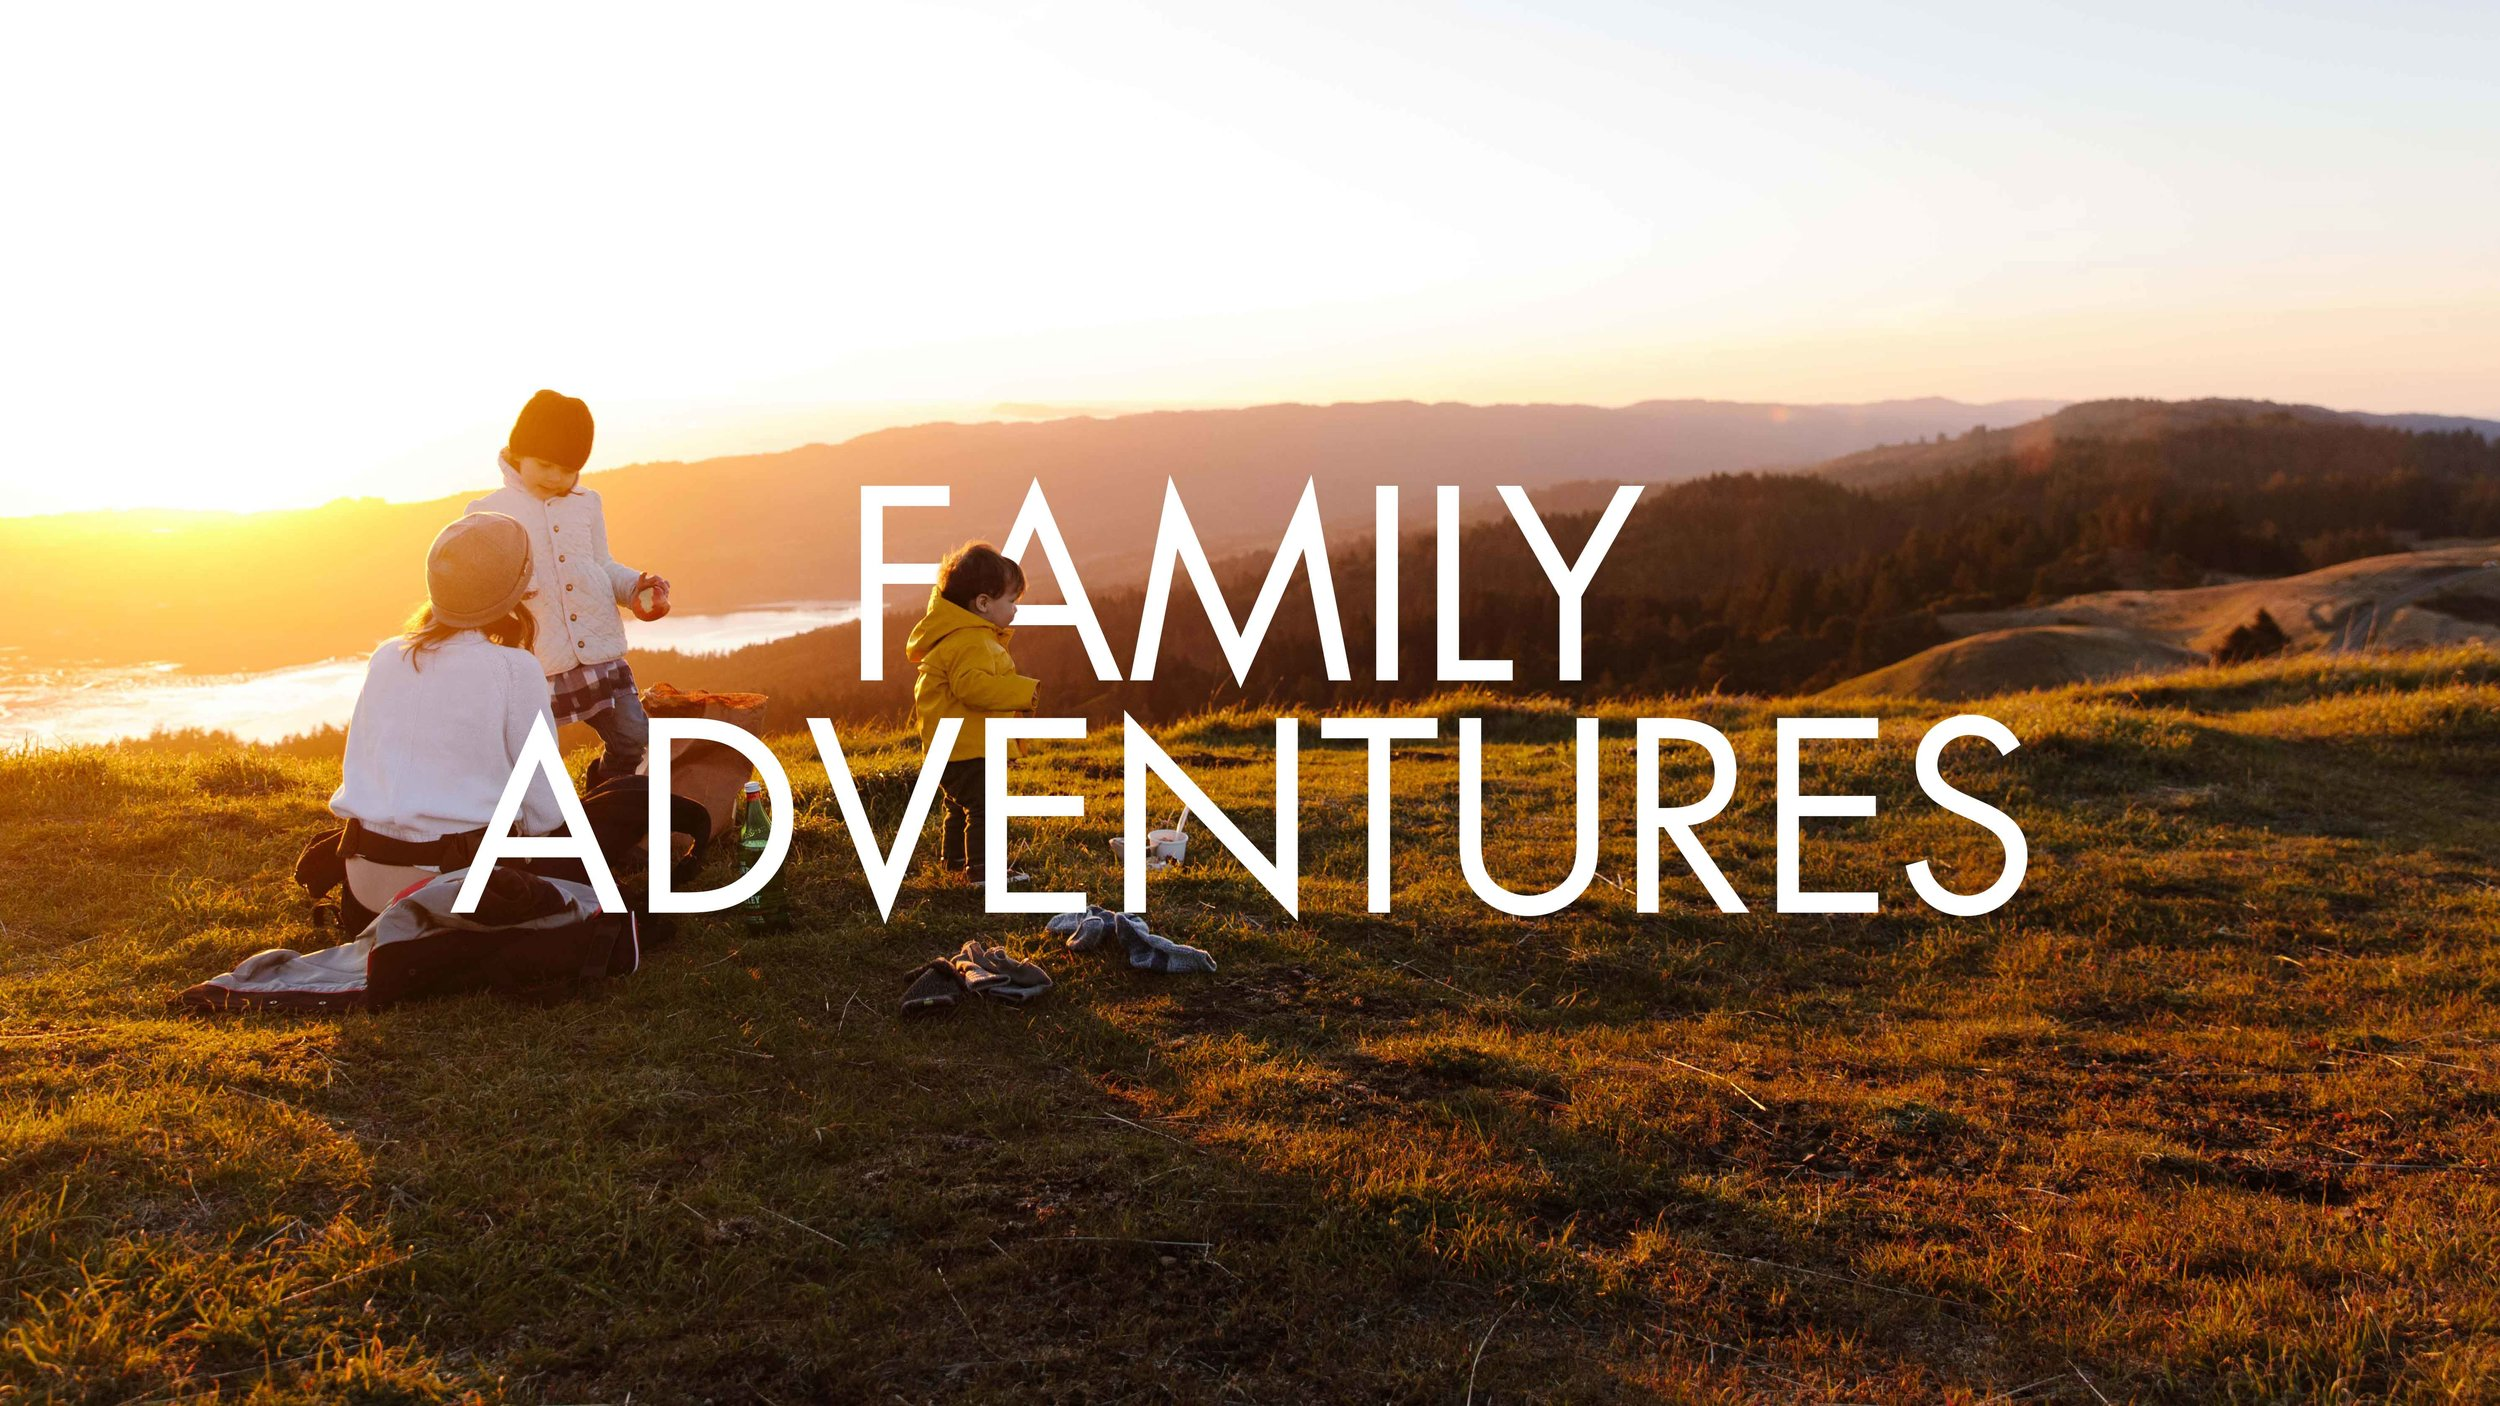 Family Adventures.jpg